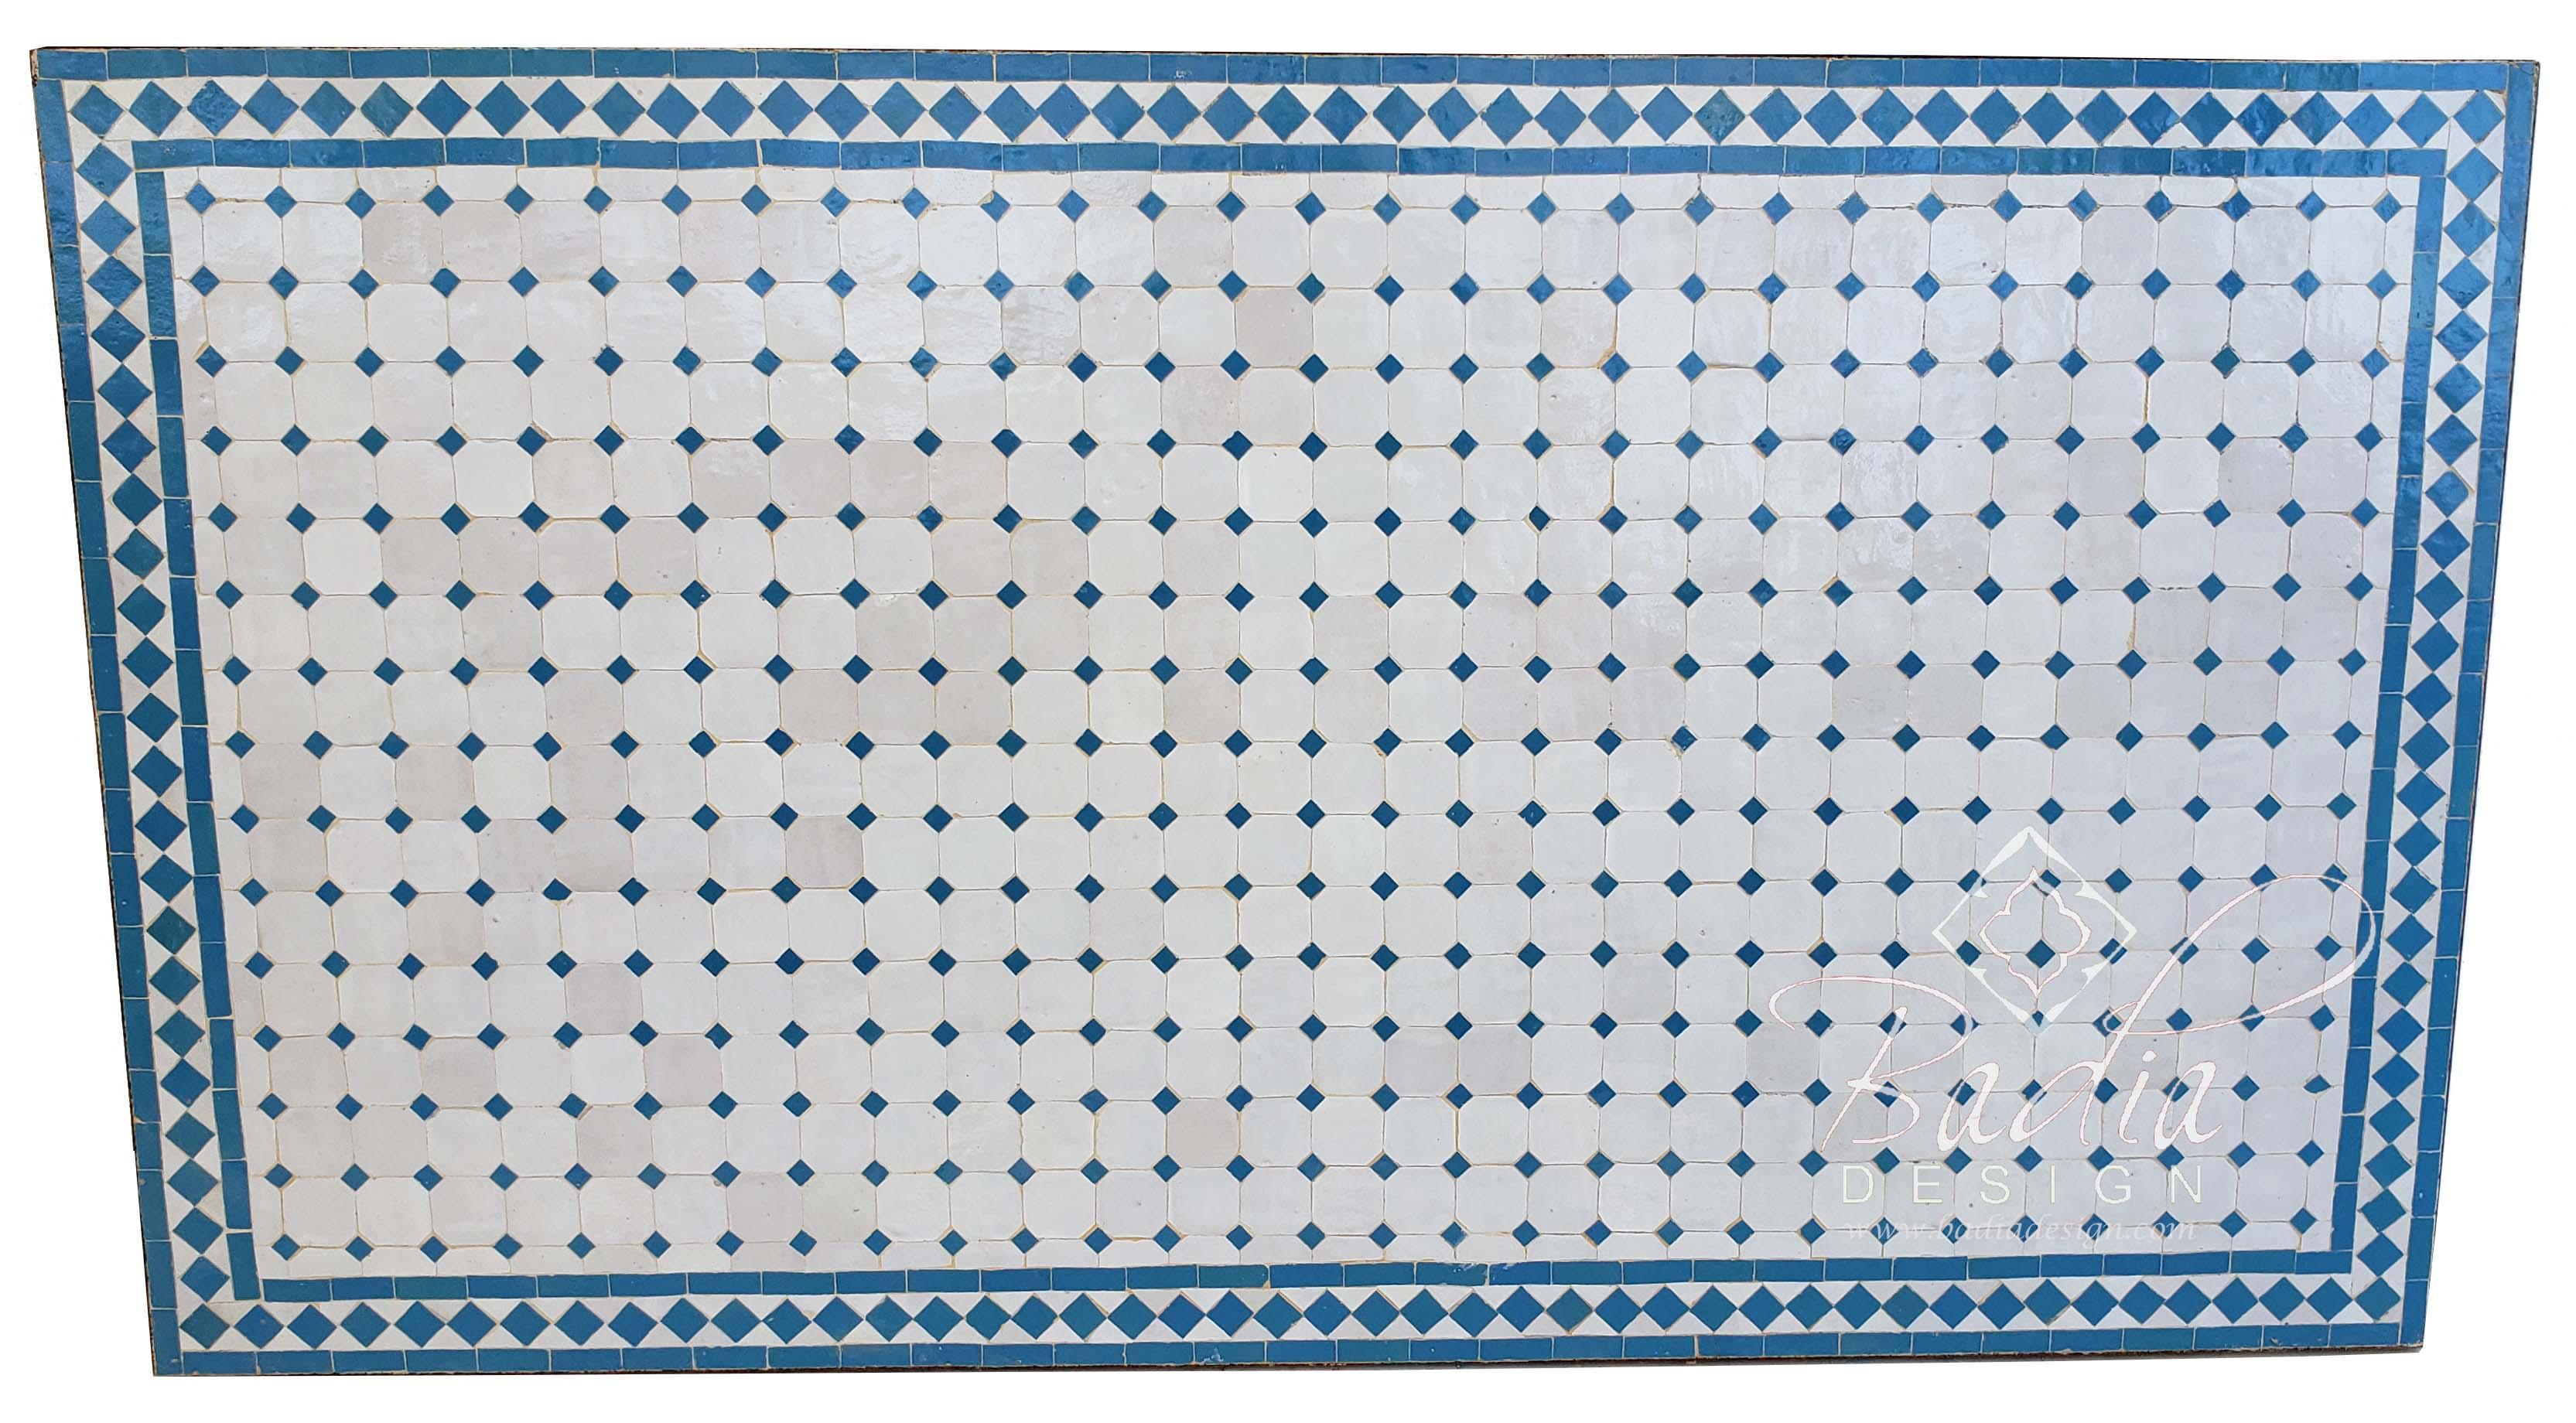 moroccan-rectangular-shaped-mosaic-tile-table-top-mt705.jpg